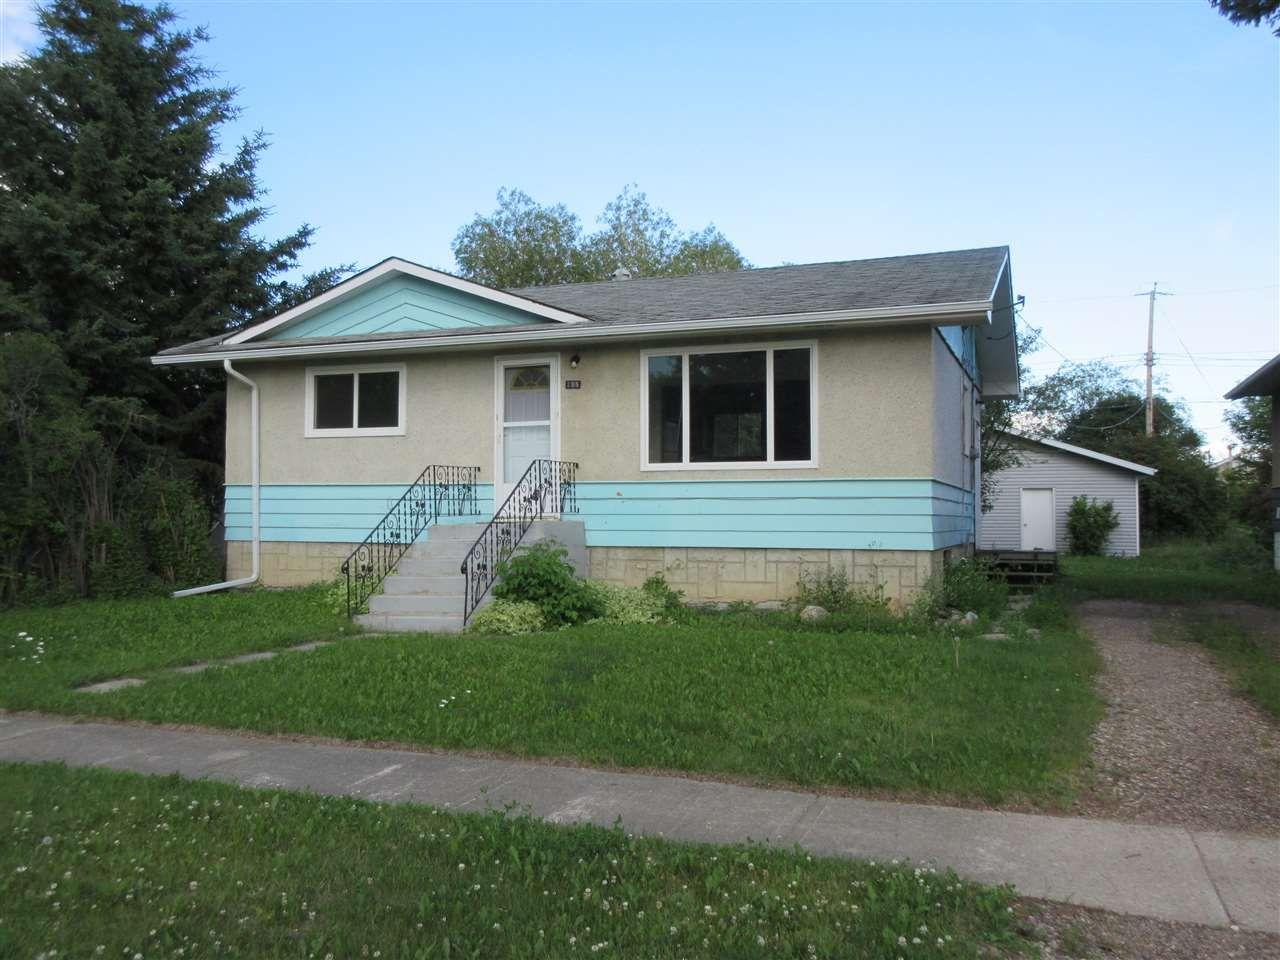 Main Photo: 205 6 Street: Thorhild House for sale : MLS®# E4100082